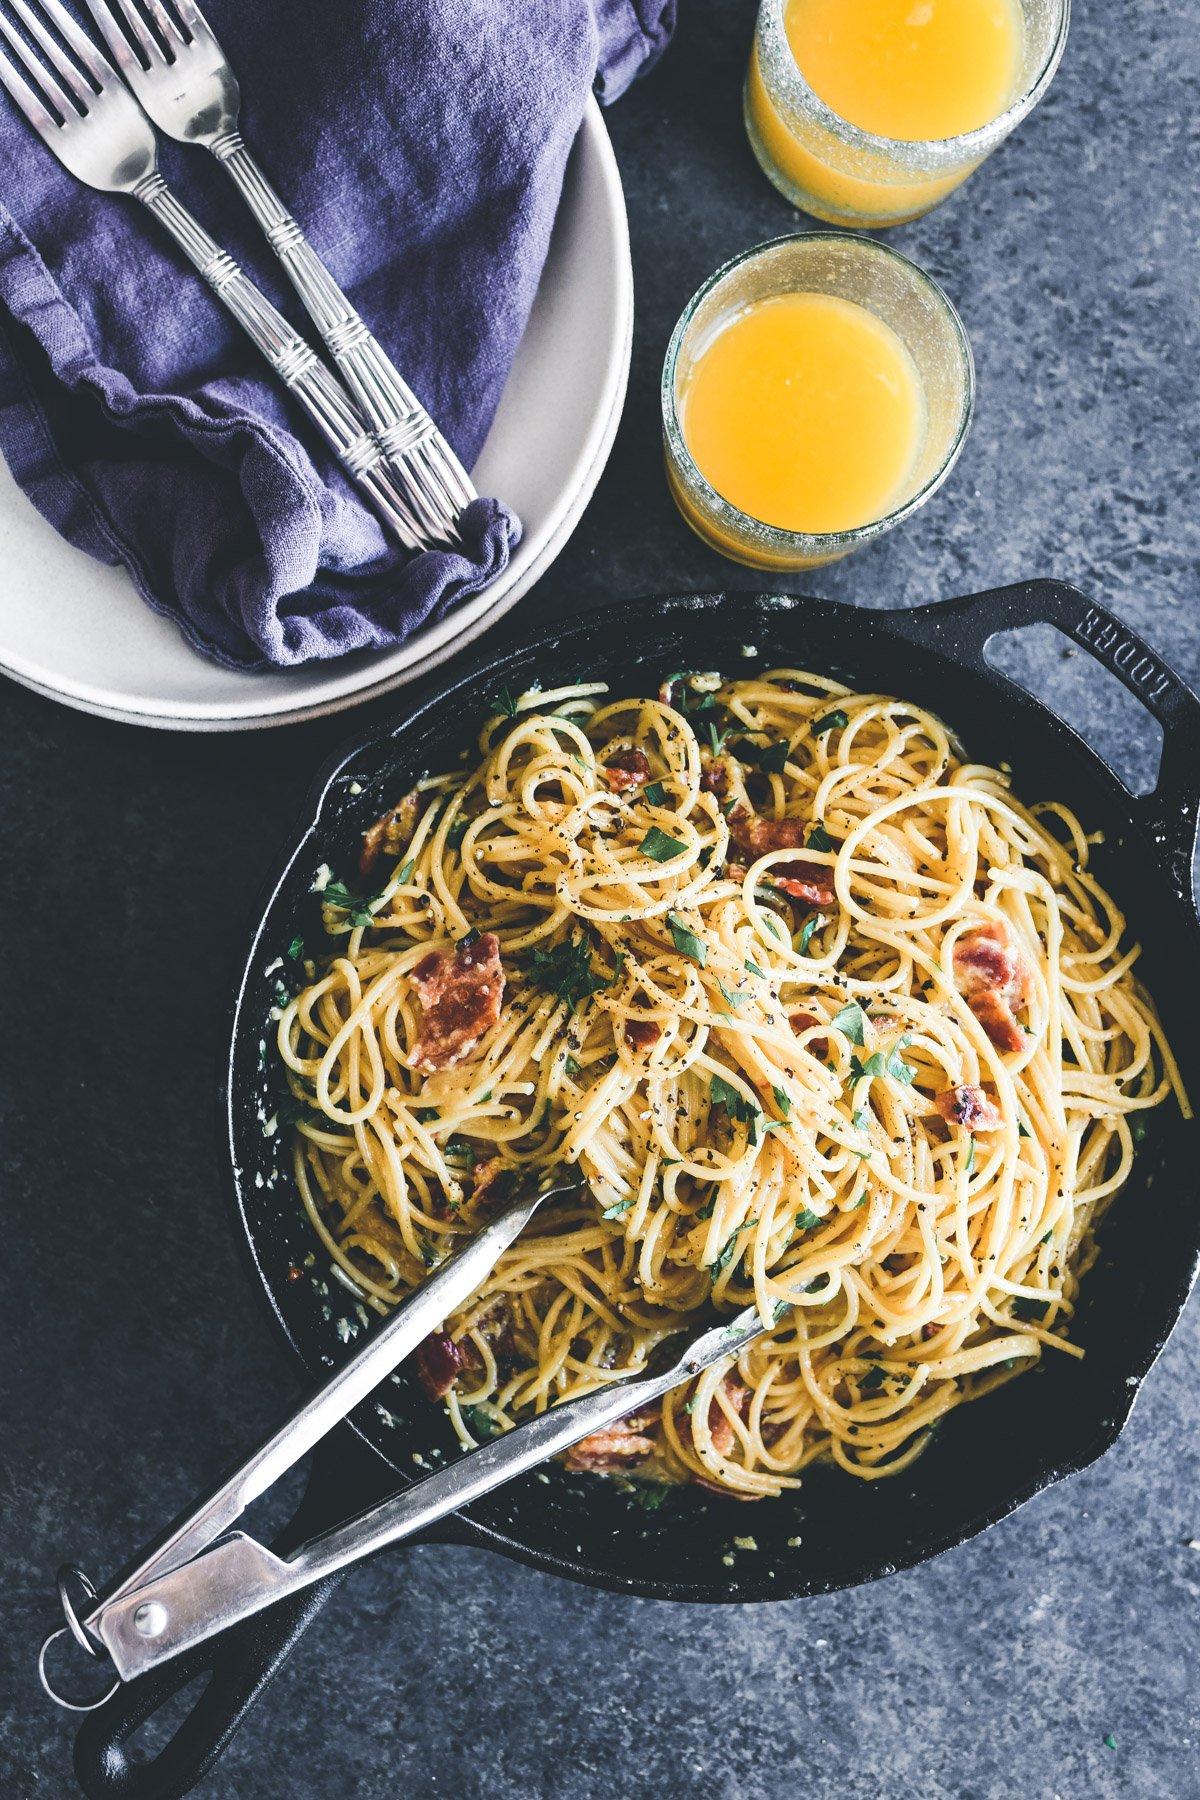 a skillet of breakfast pasta with orange juice